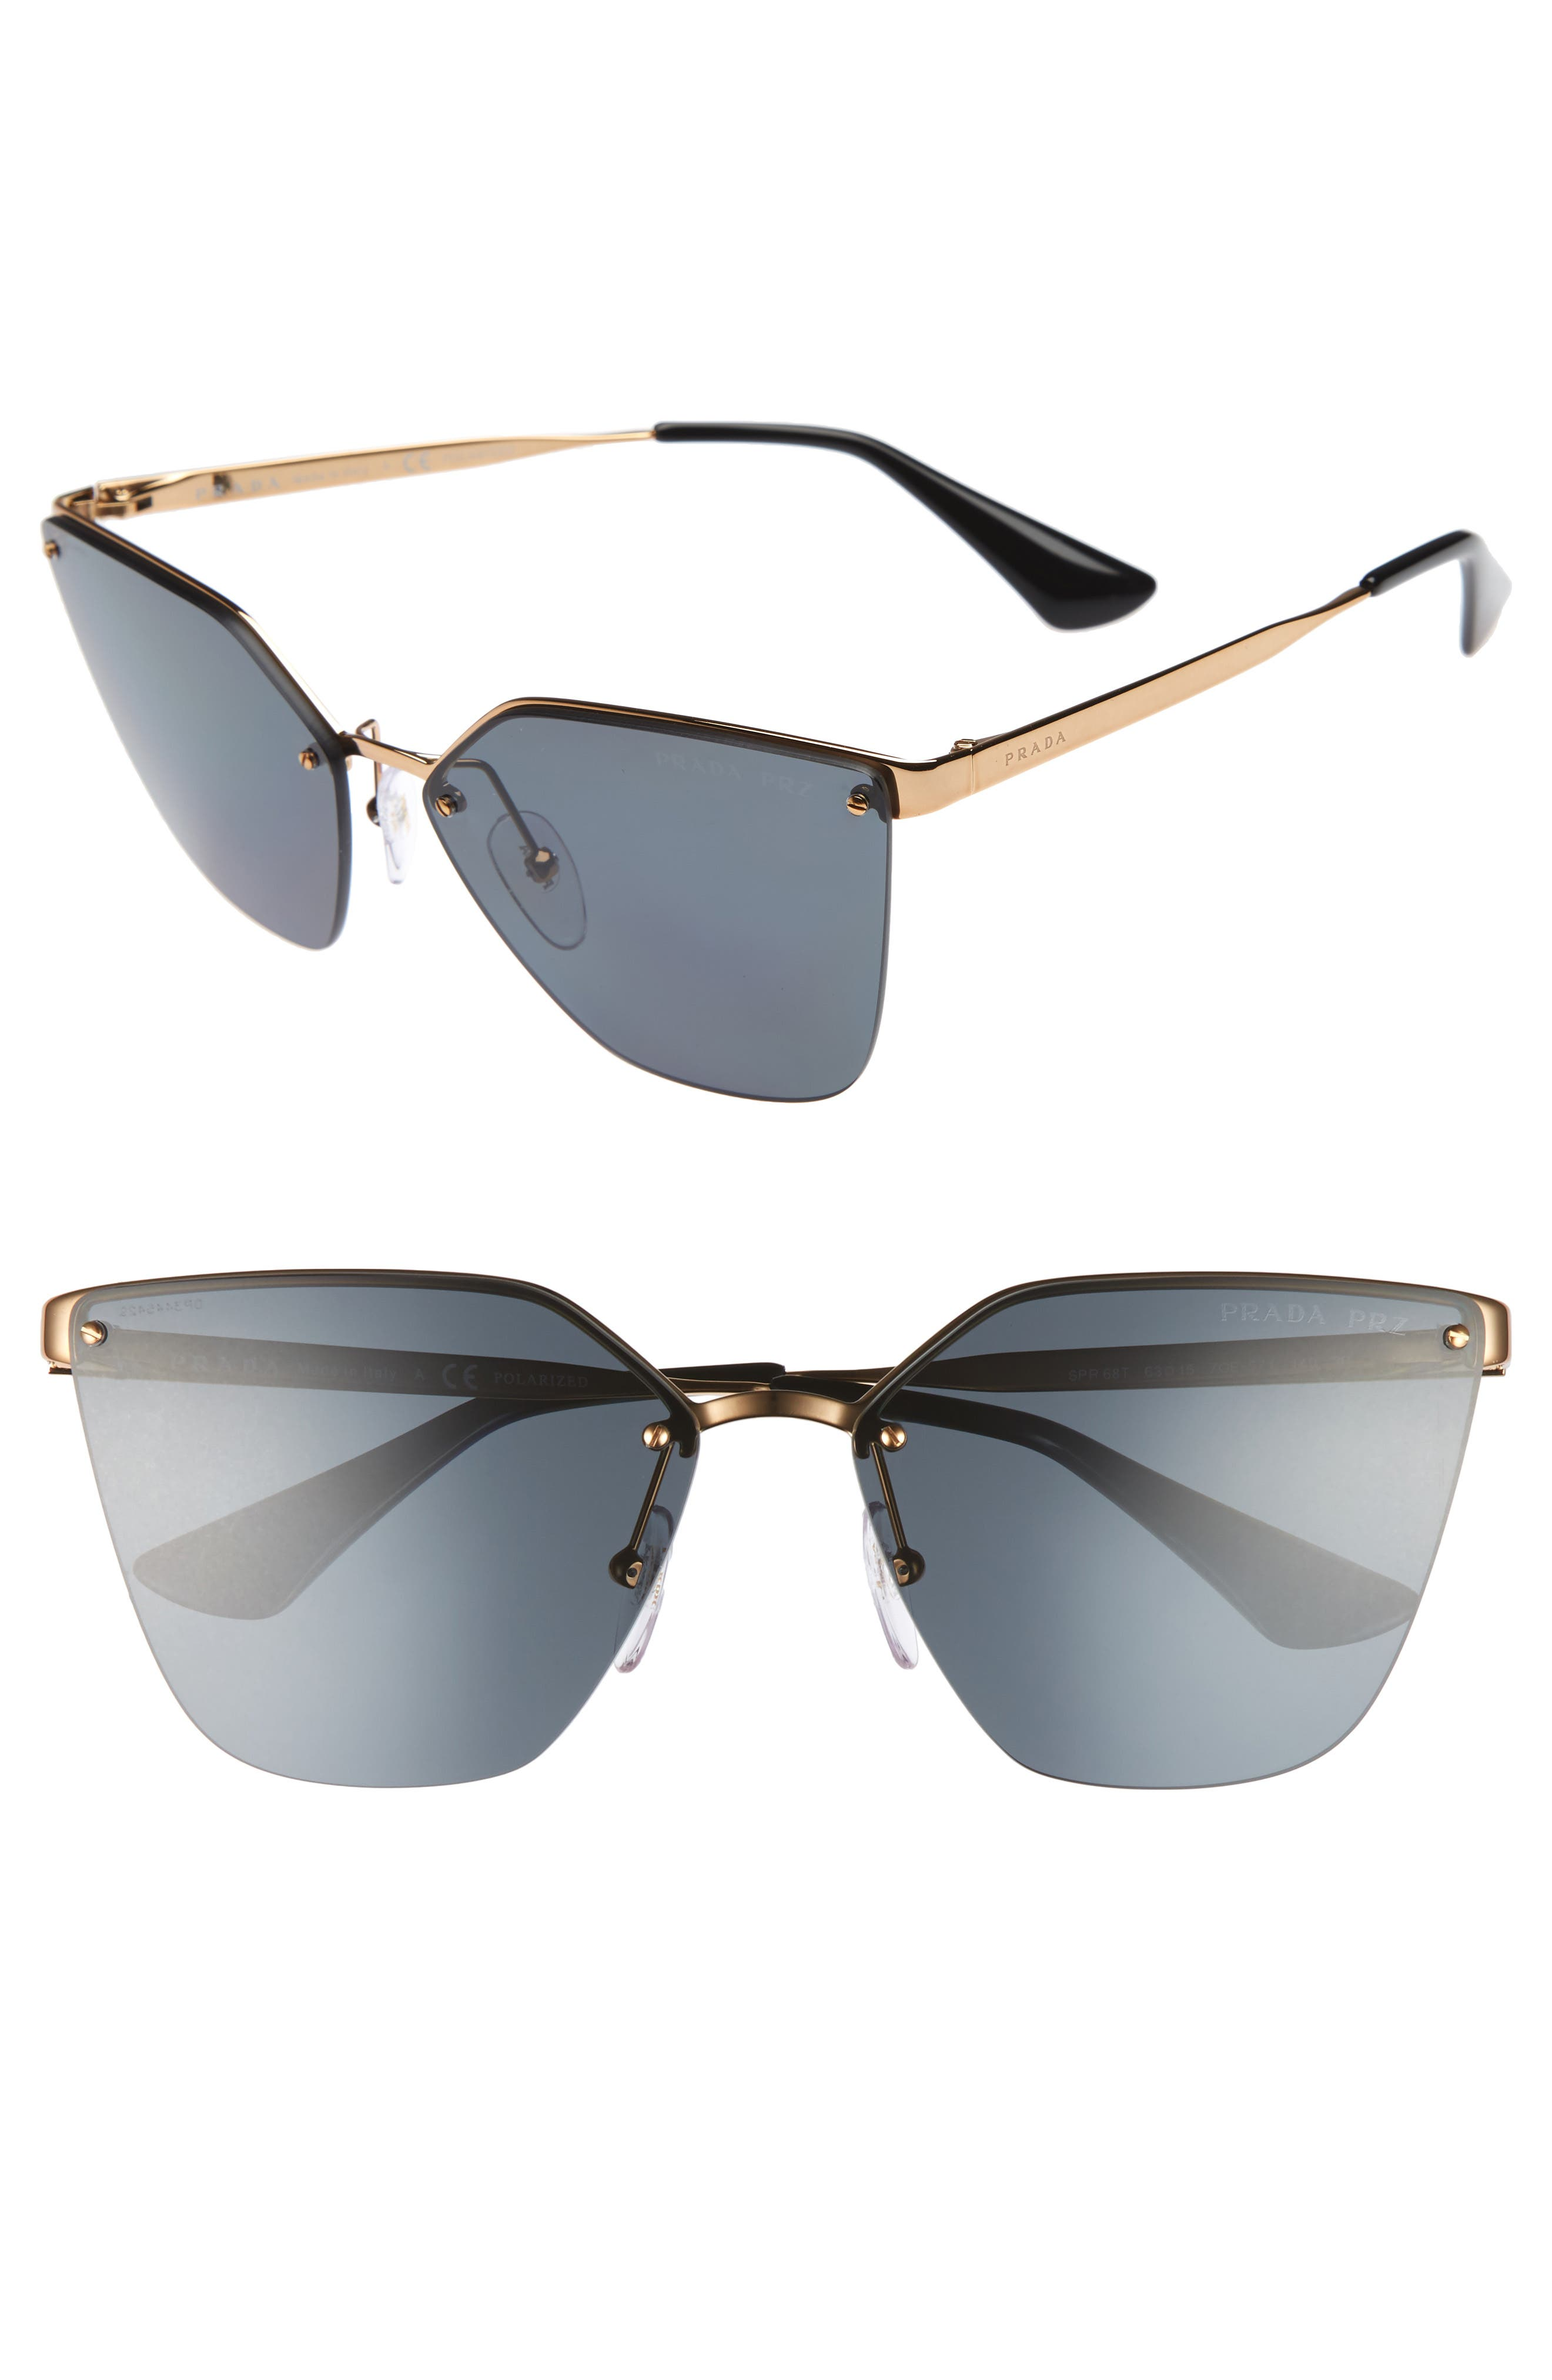 63mm Oversize Rimless Sunglasses,                             Main thumbnail 1, color,                             Black/ Green